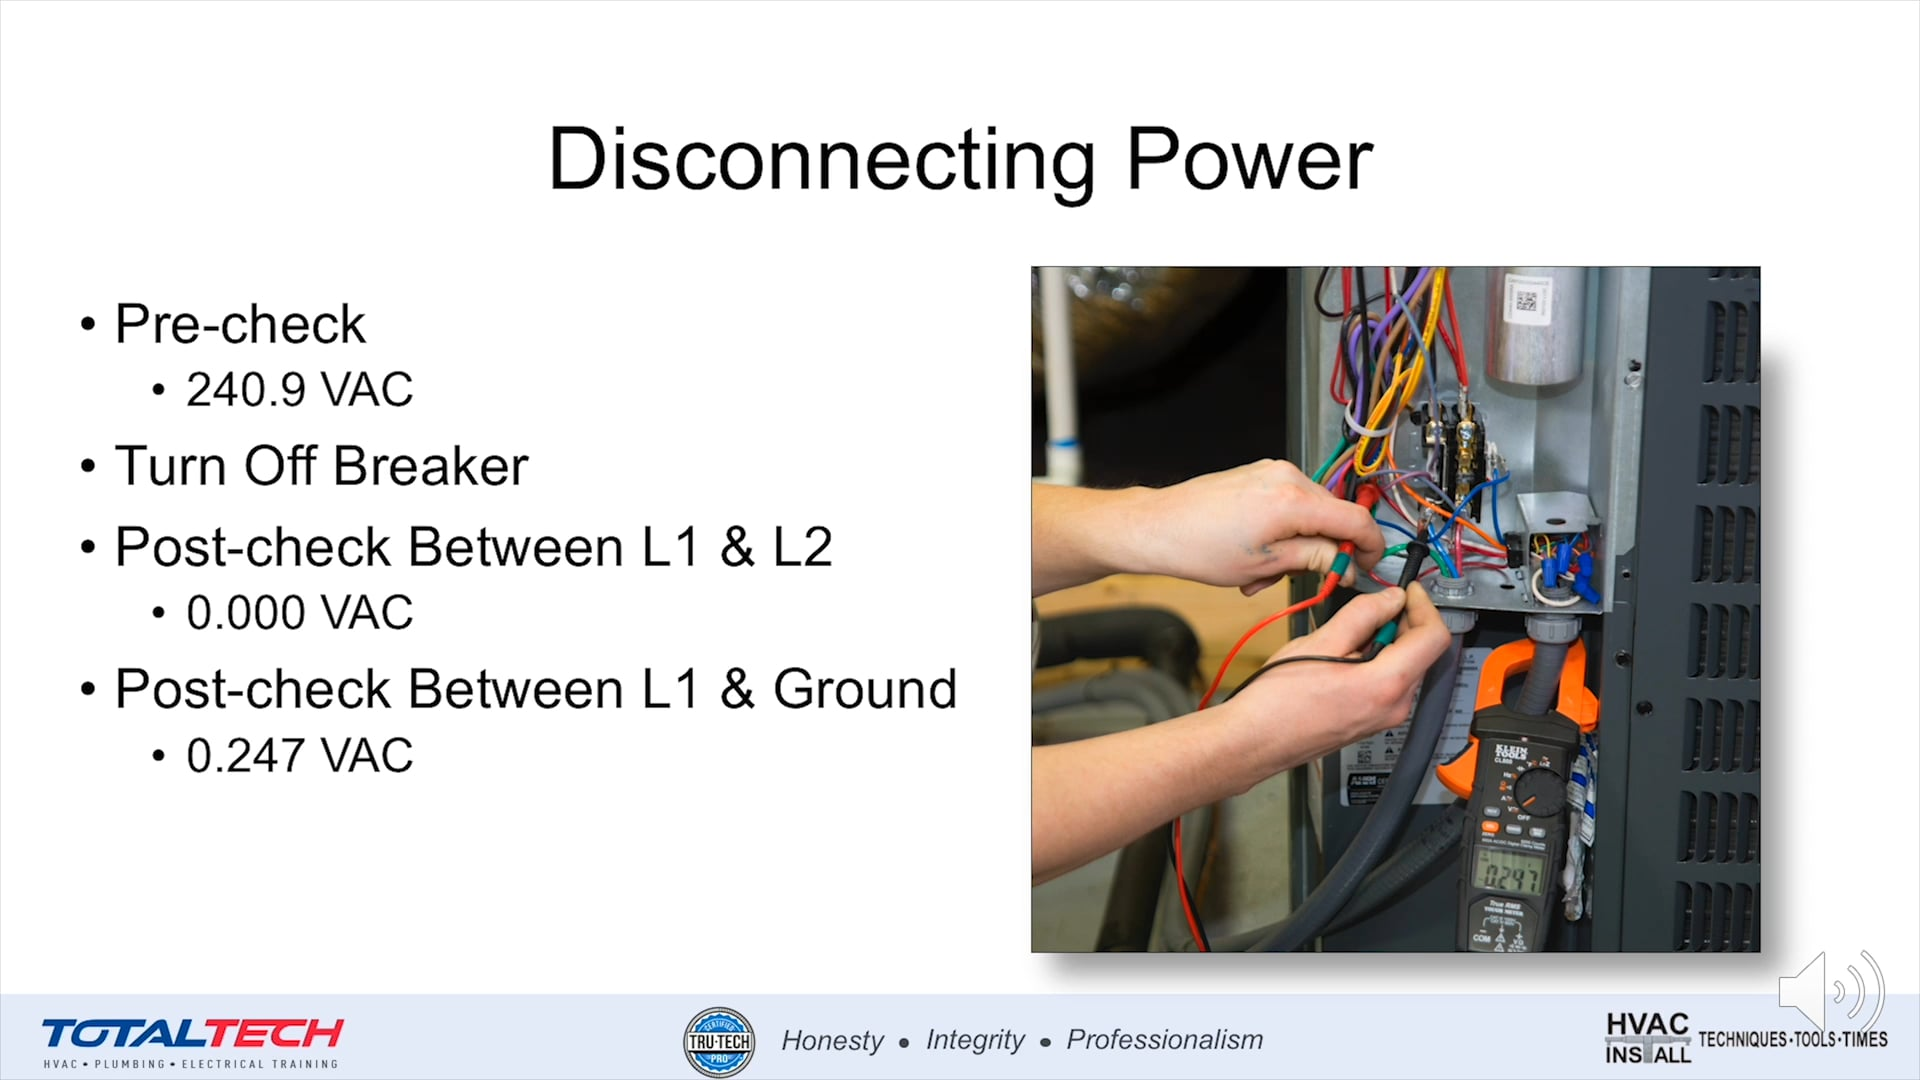 Installation-Disconnecting Power